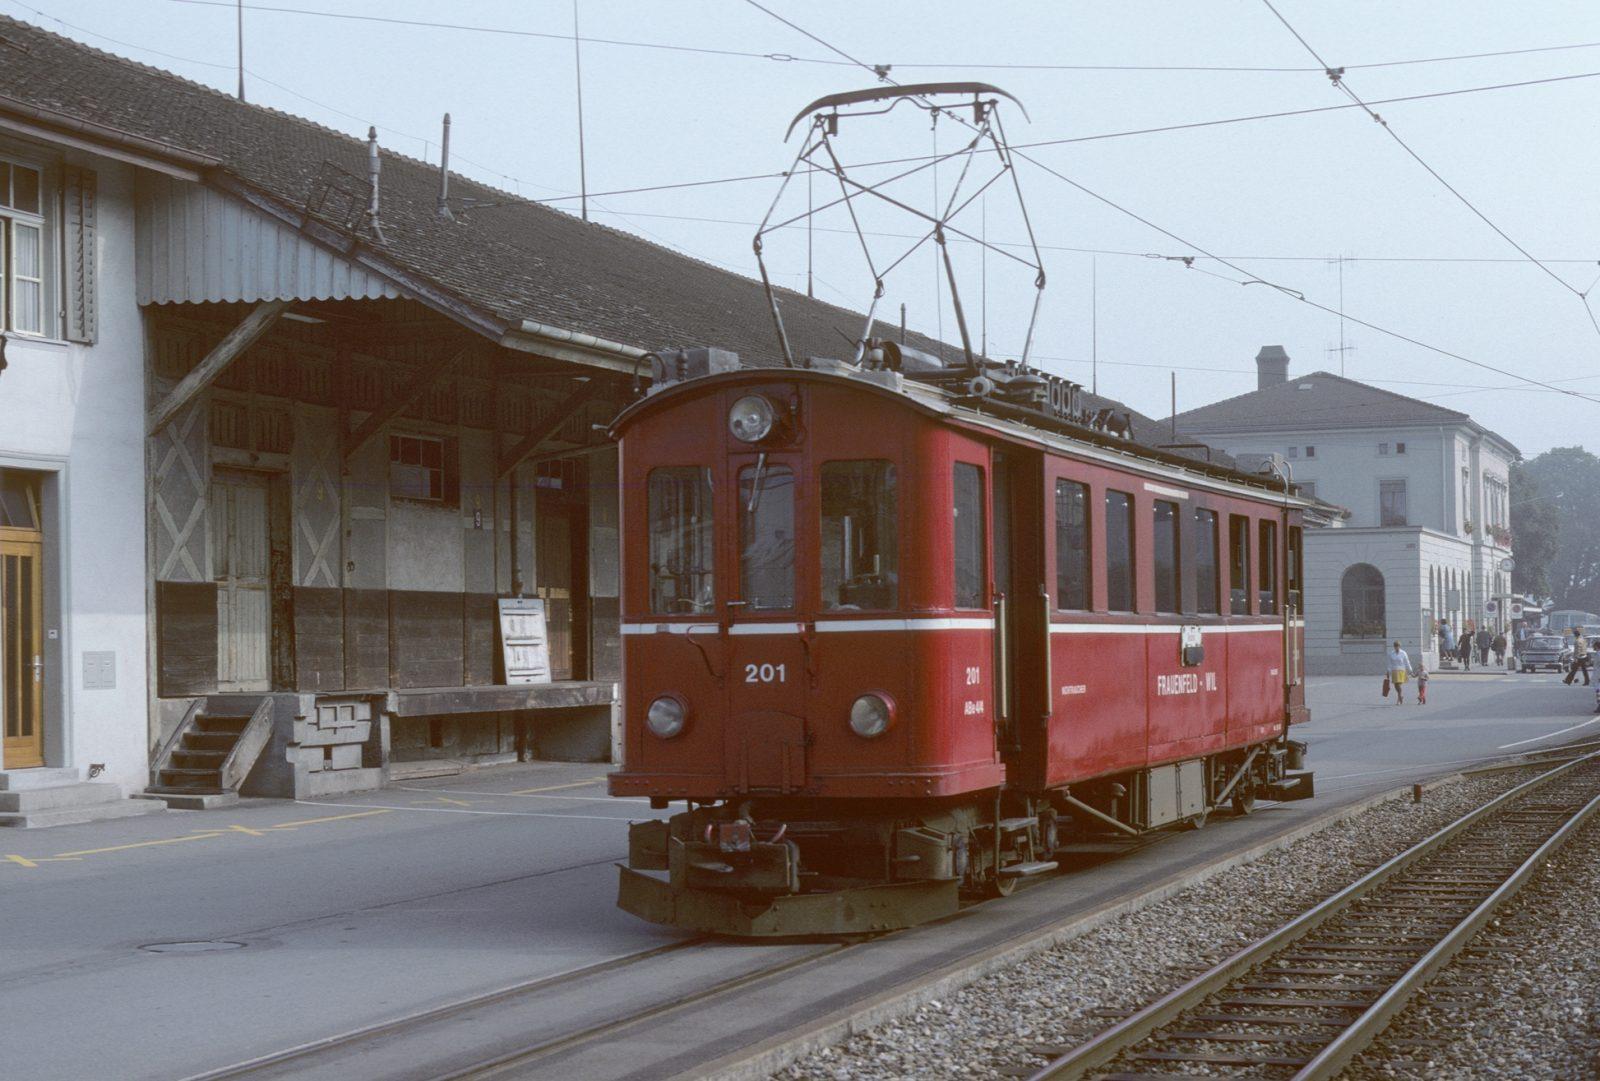 Wilerbahn Frauenfeld SBB